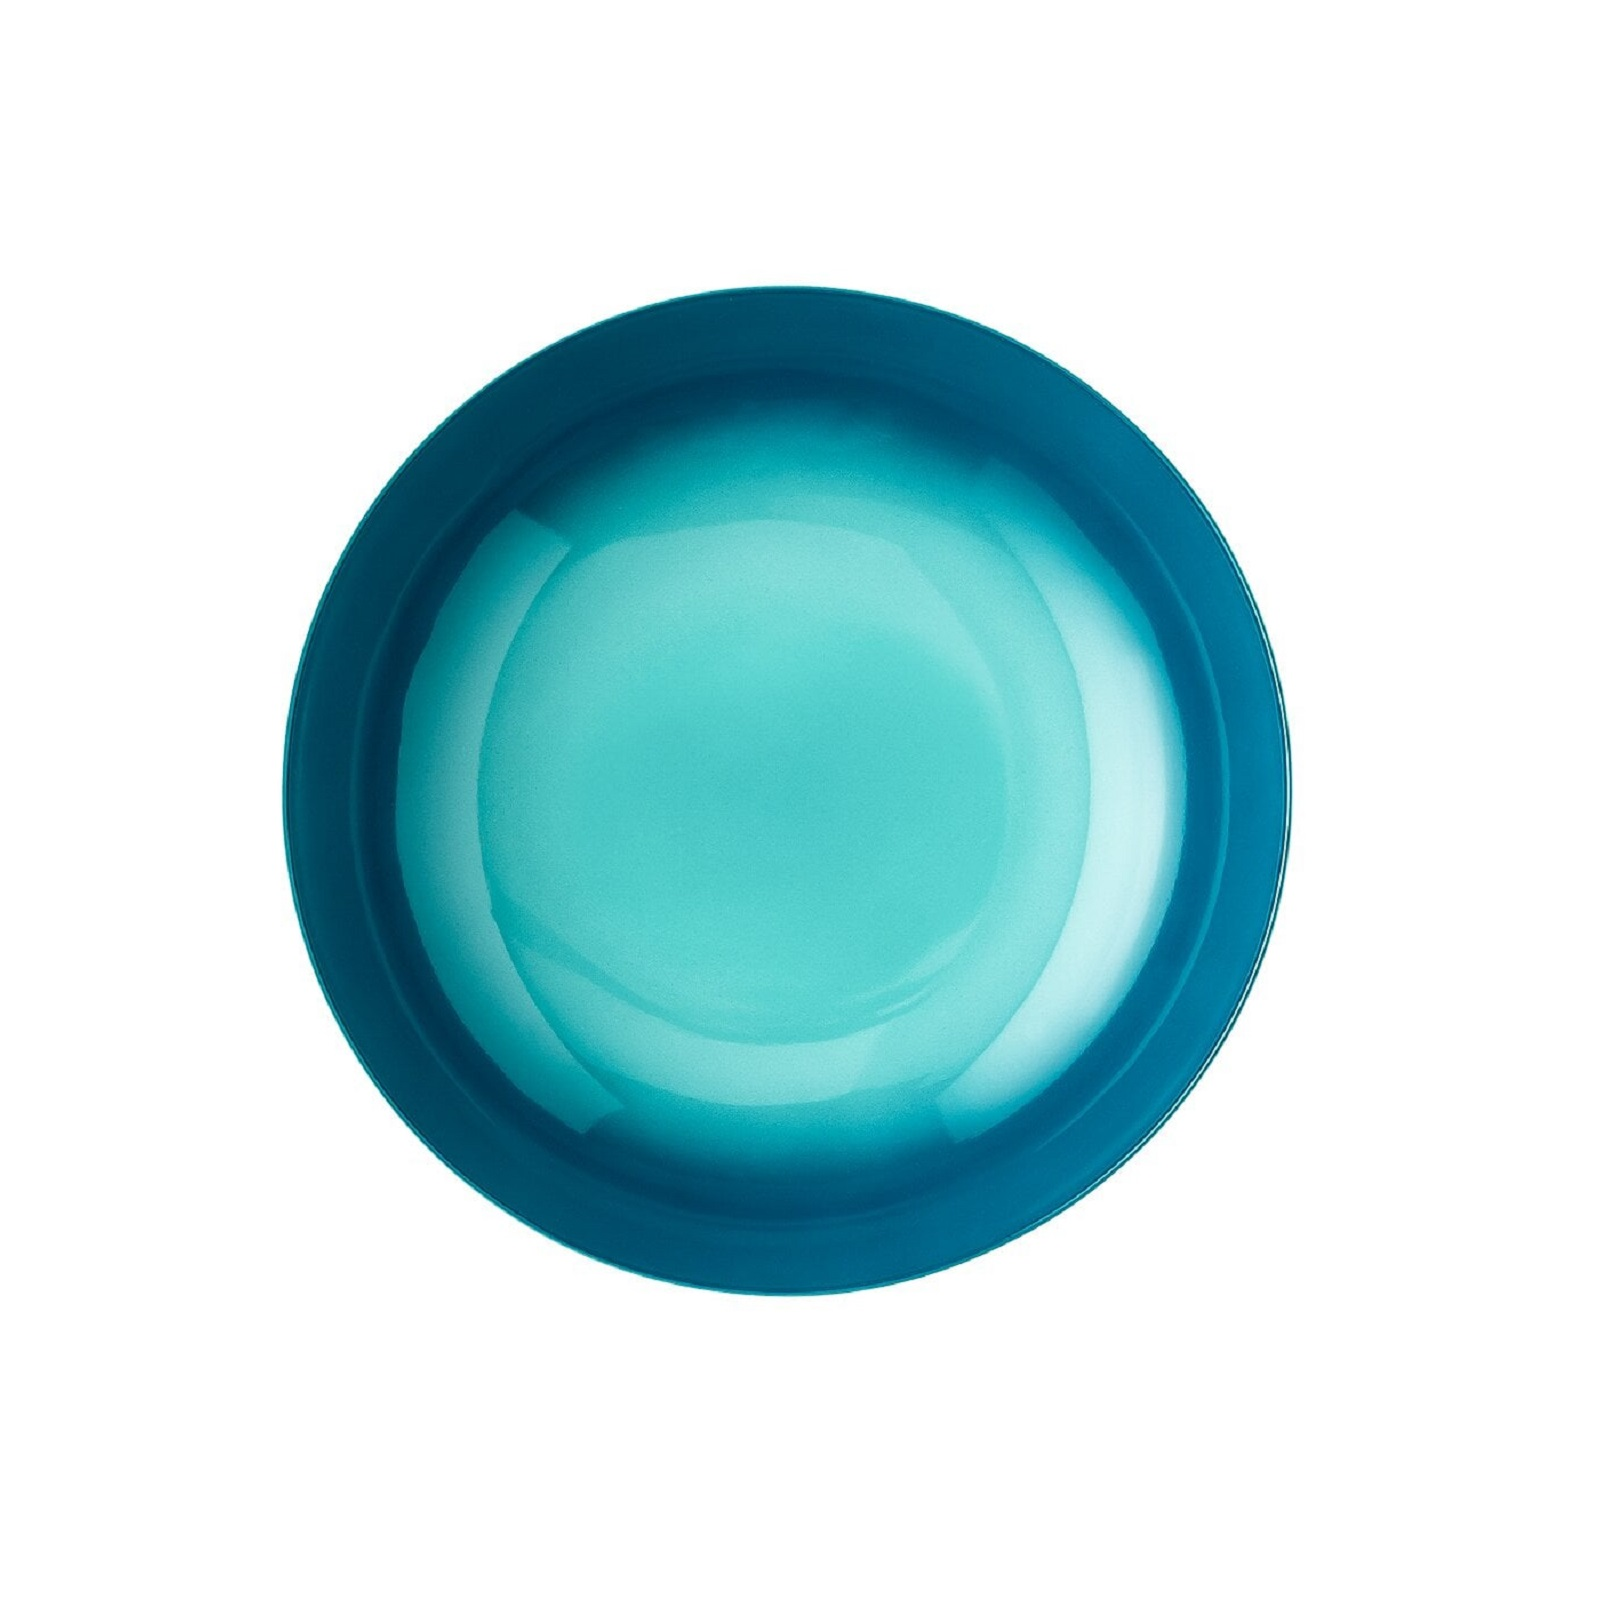 Онлайн каталог PROMENU: Тарелка глубокая фарфоровая Rosenthal Thomas BECOLOUR, диаметр 22 см, синий Rosenthal 10700-408729-10322